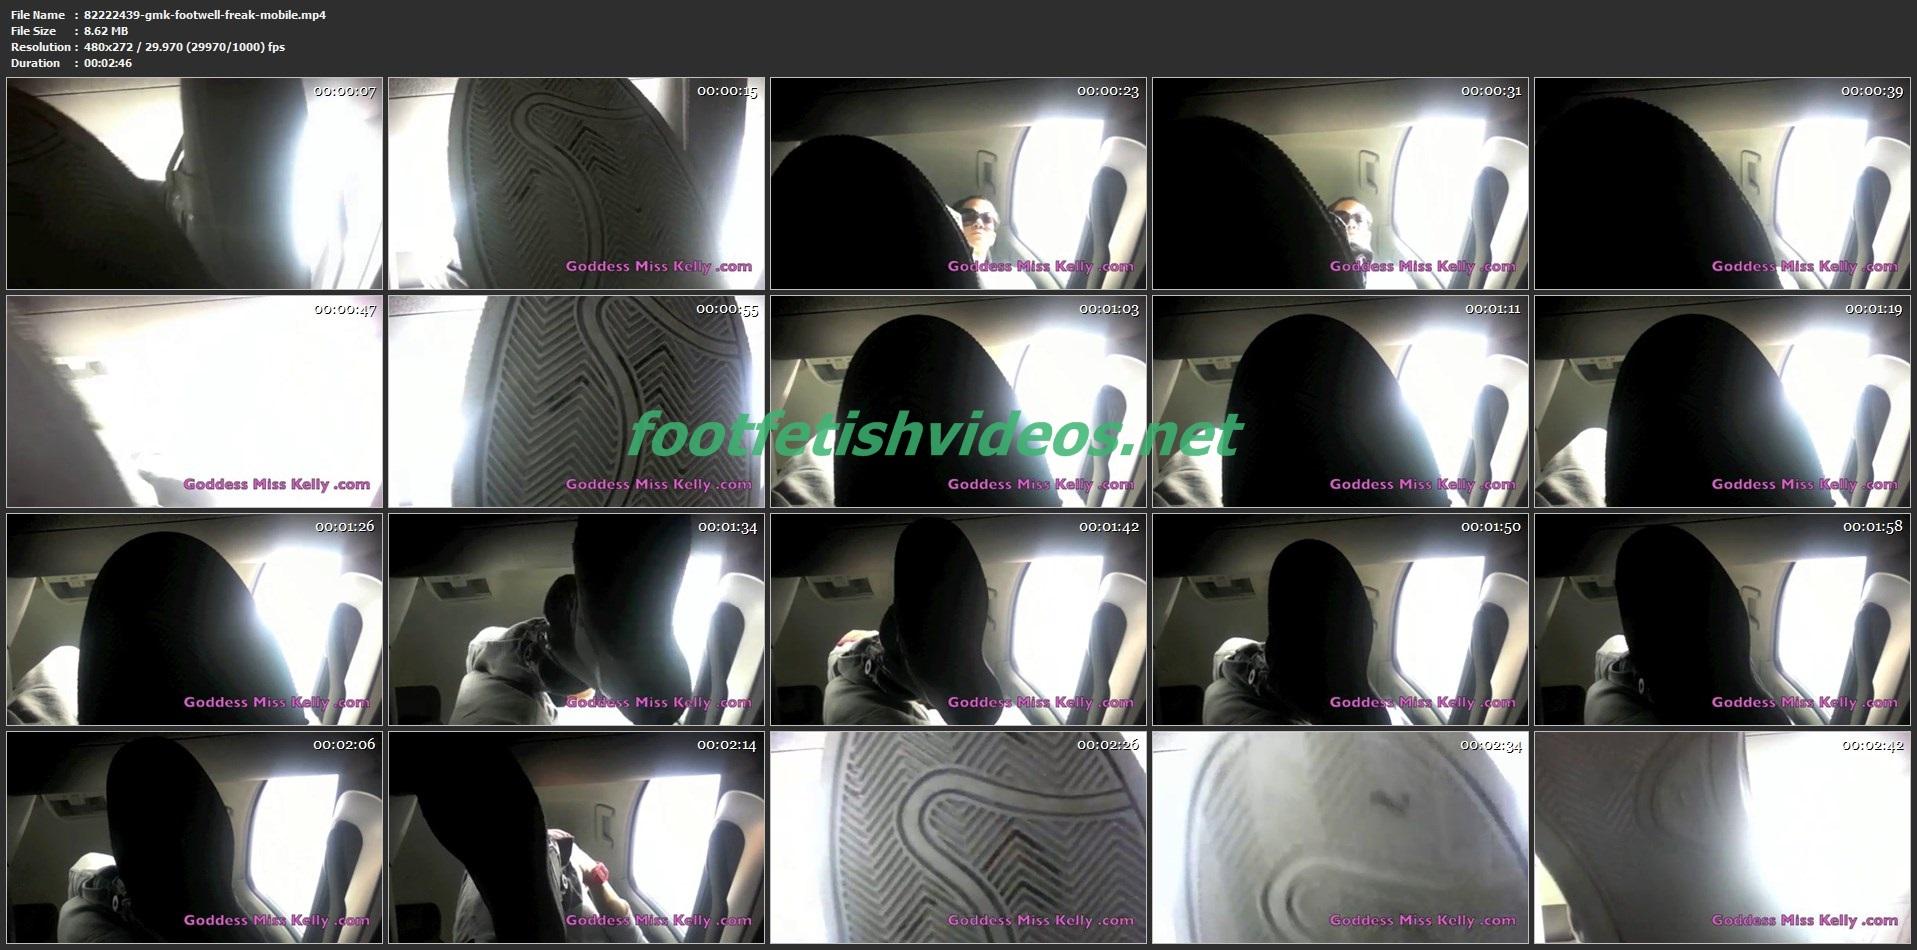 goddessmskelly-82222439-gmk-footwell-freak-mobile-mp4